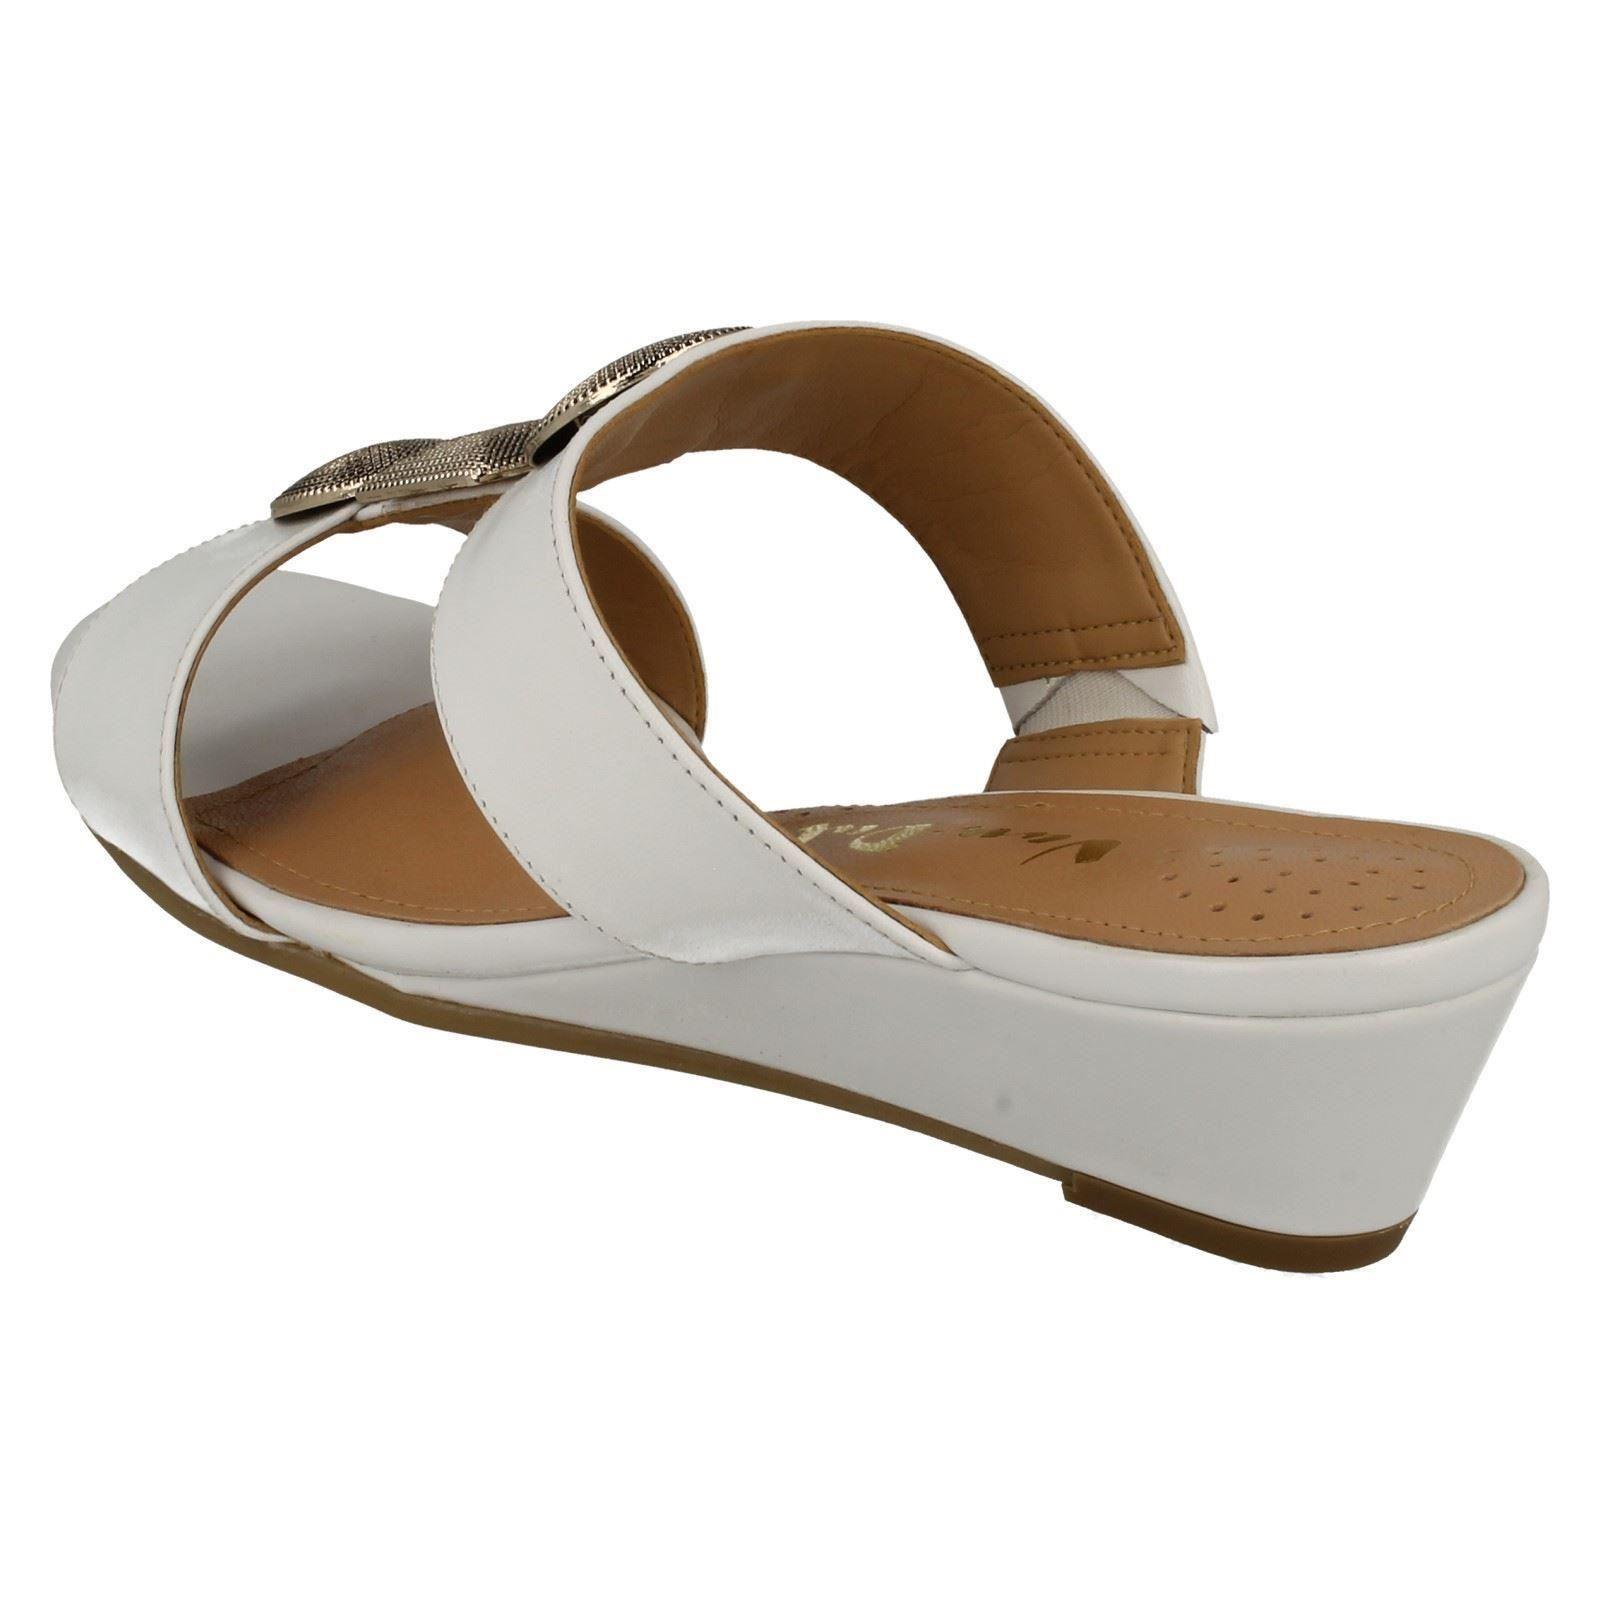 Ladies-Van-Dal-Open-Toe-Slip-On-Summer-Low-Wedge-Leather-Sandals-Epsom thumbnail 4